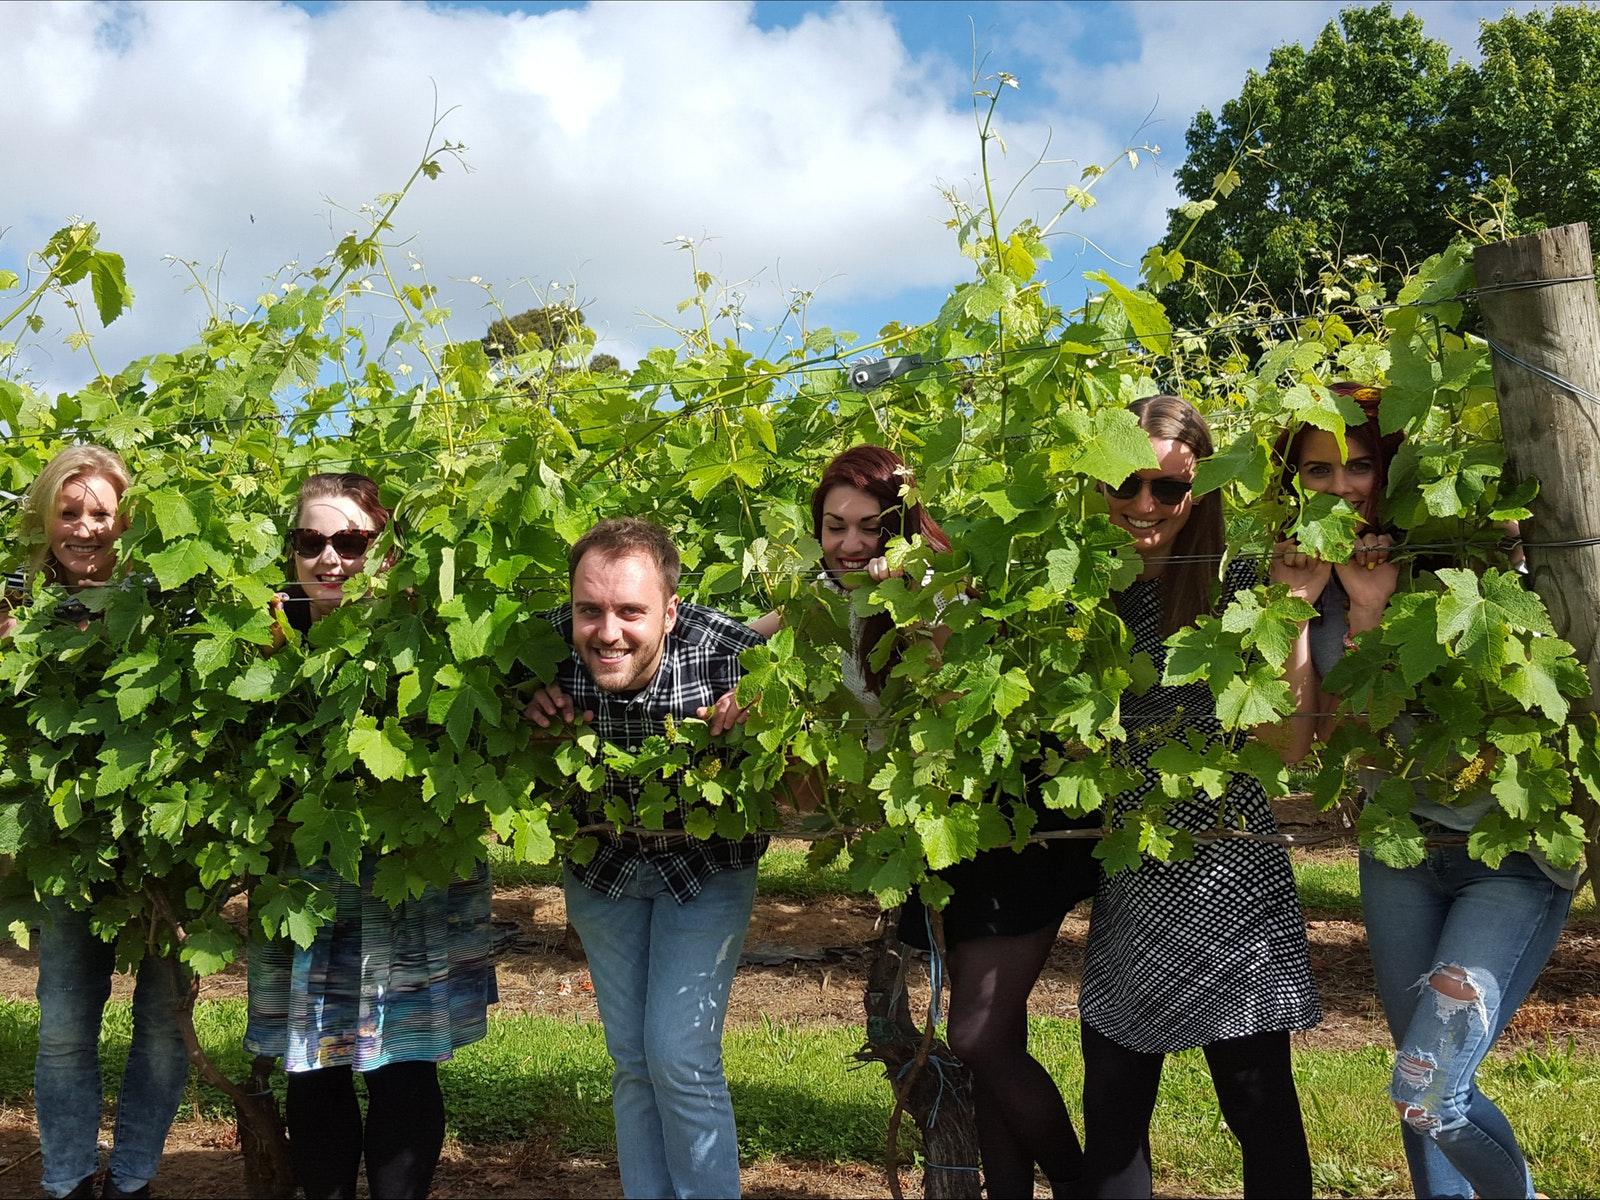 Grampians Wine Tour